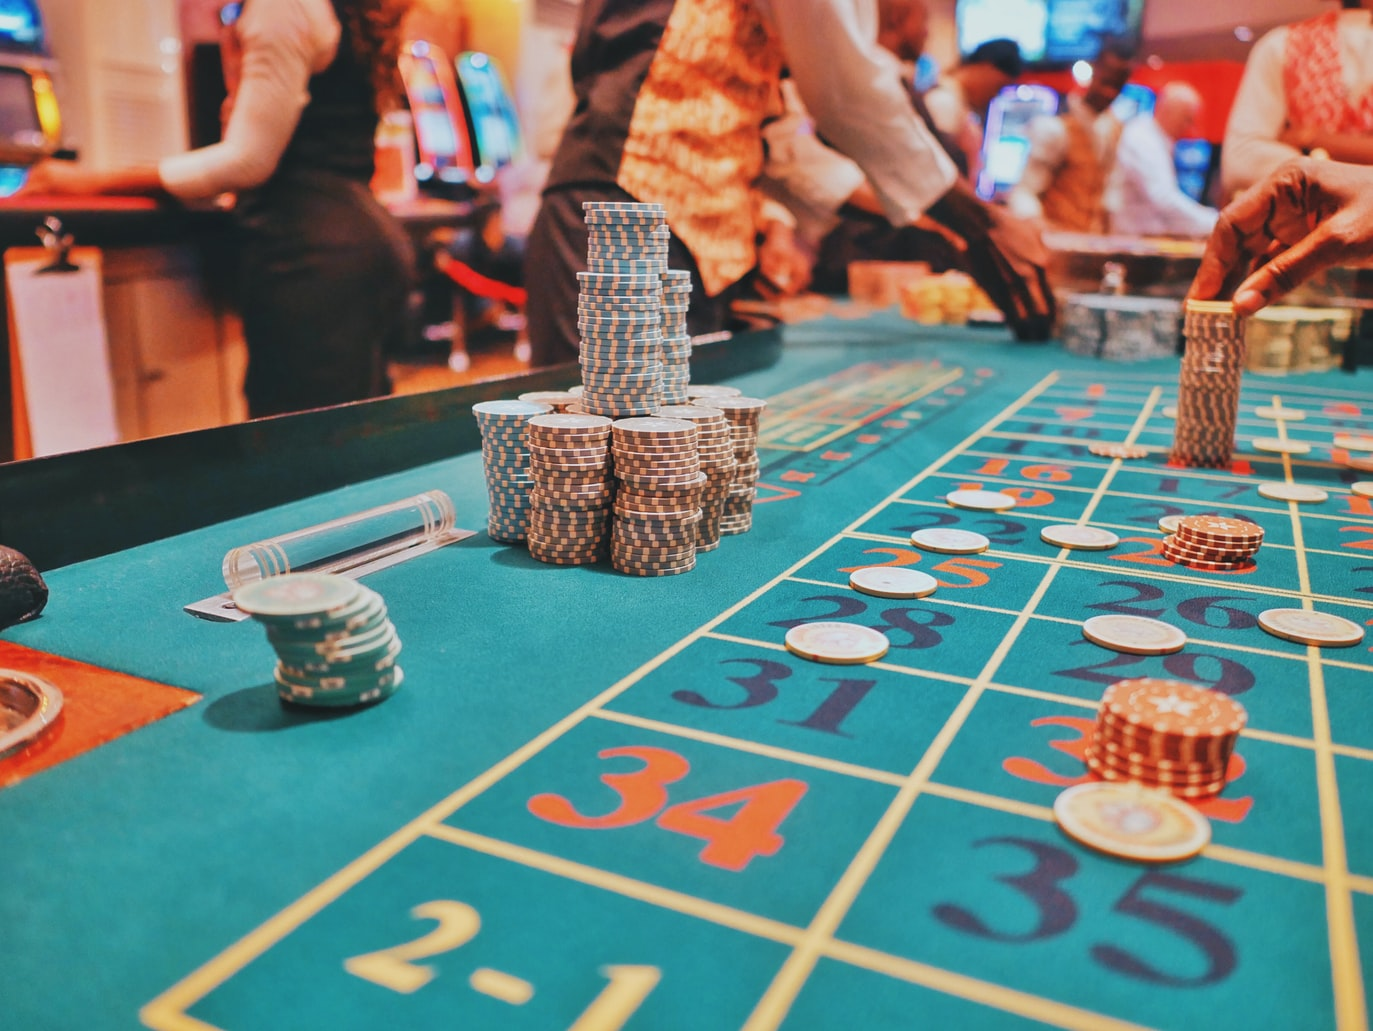 September Casino Gaming Revenue Tops $165M